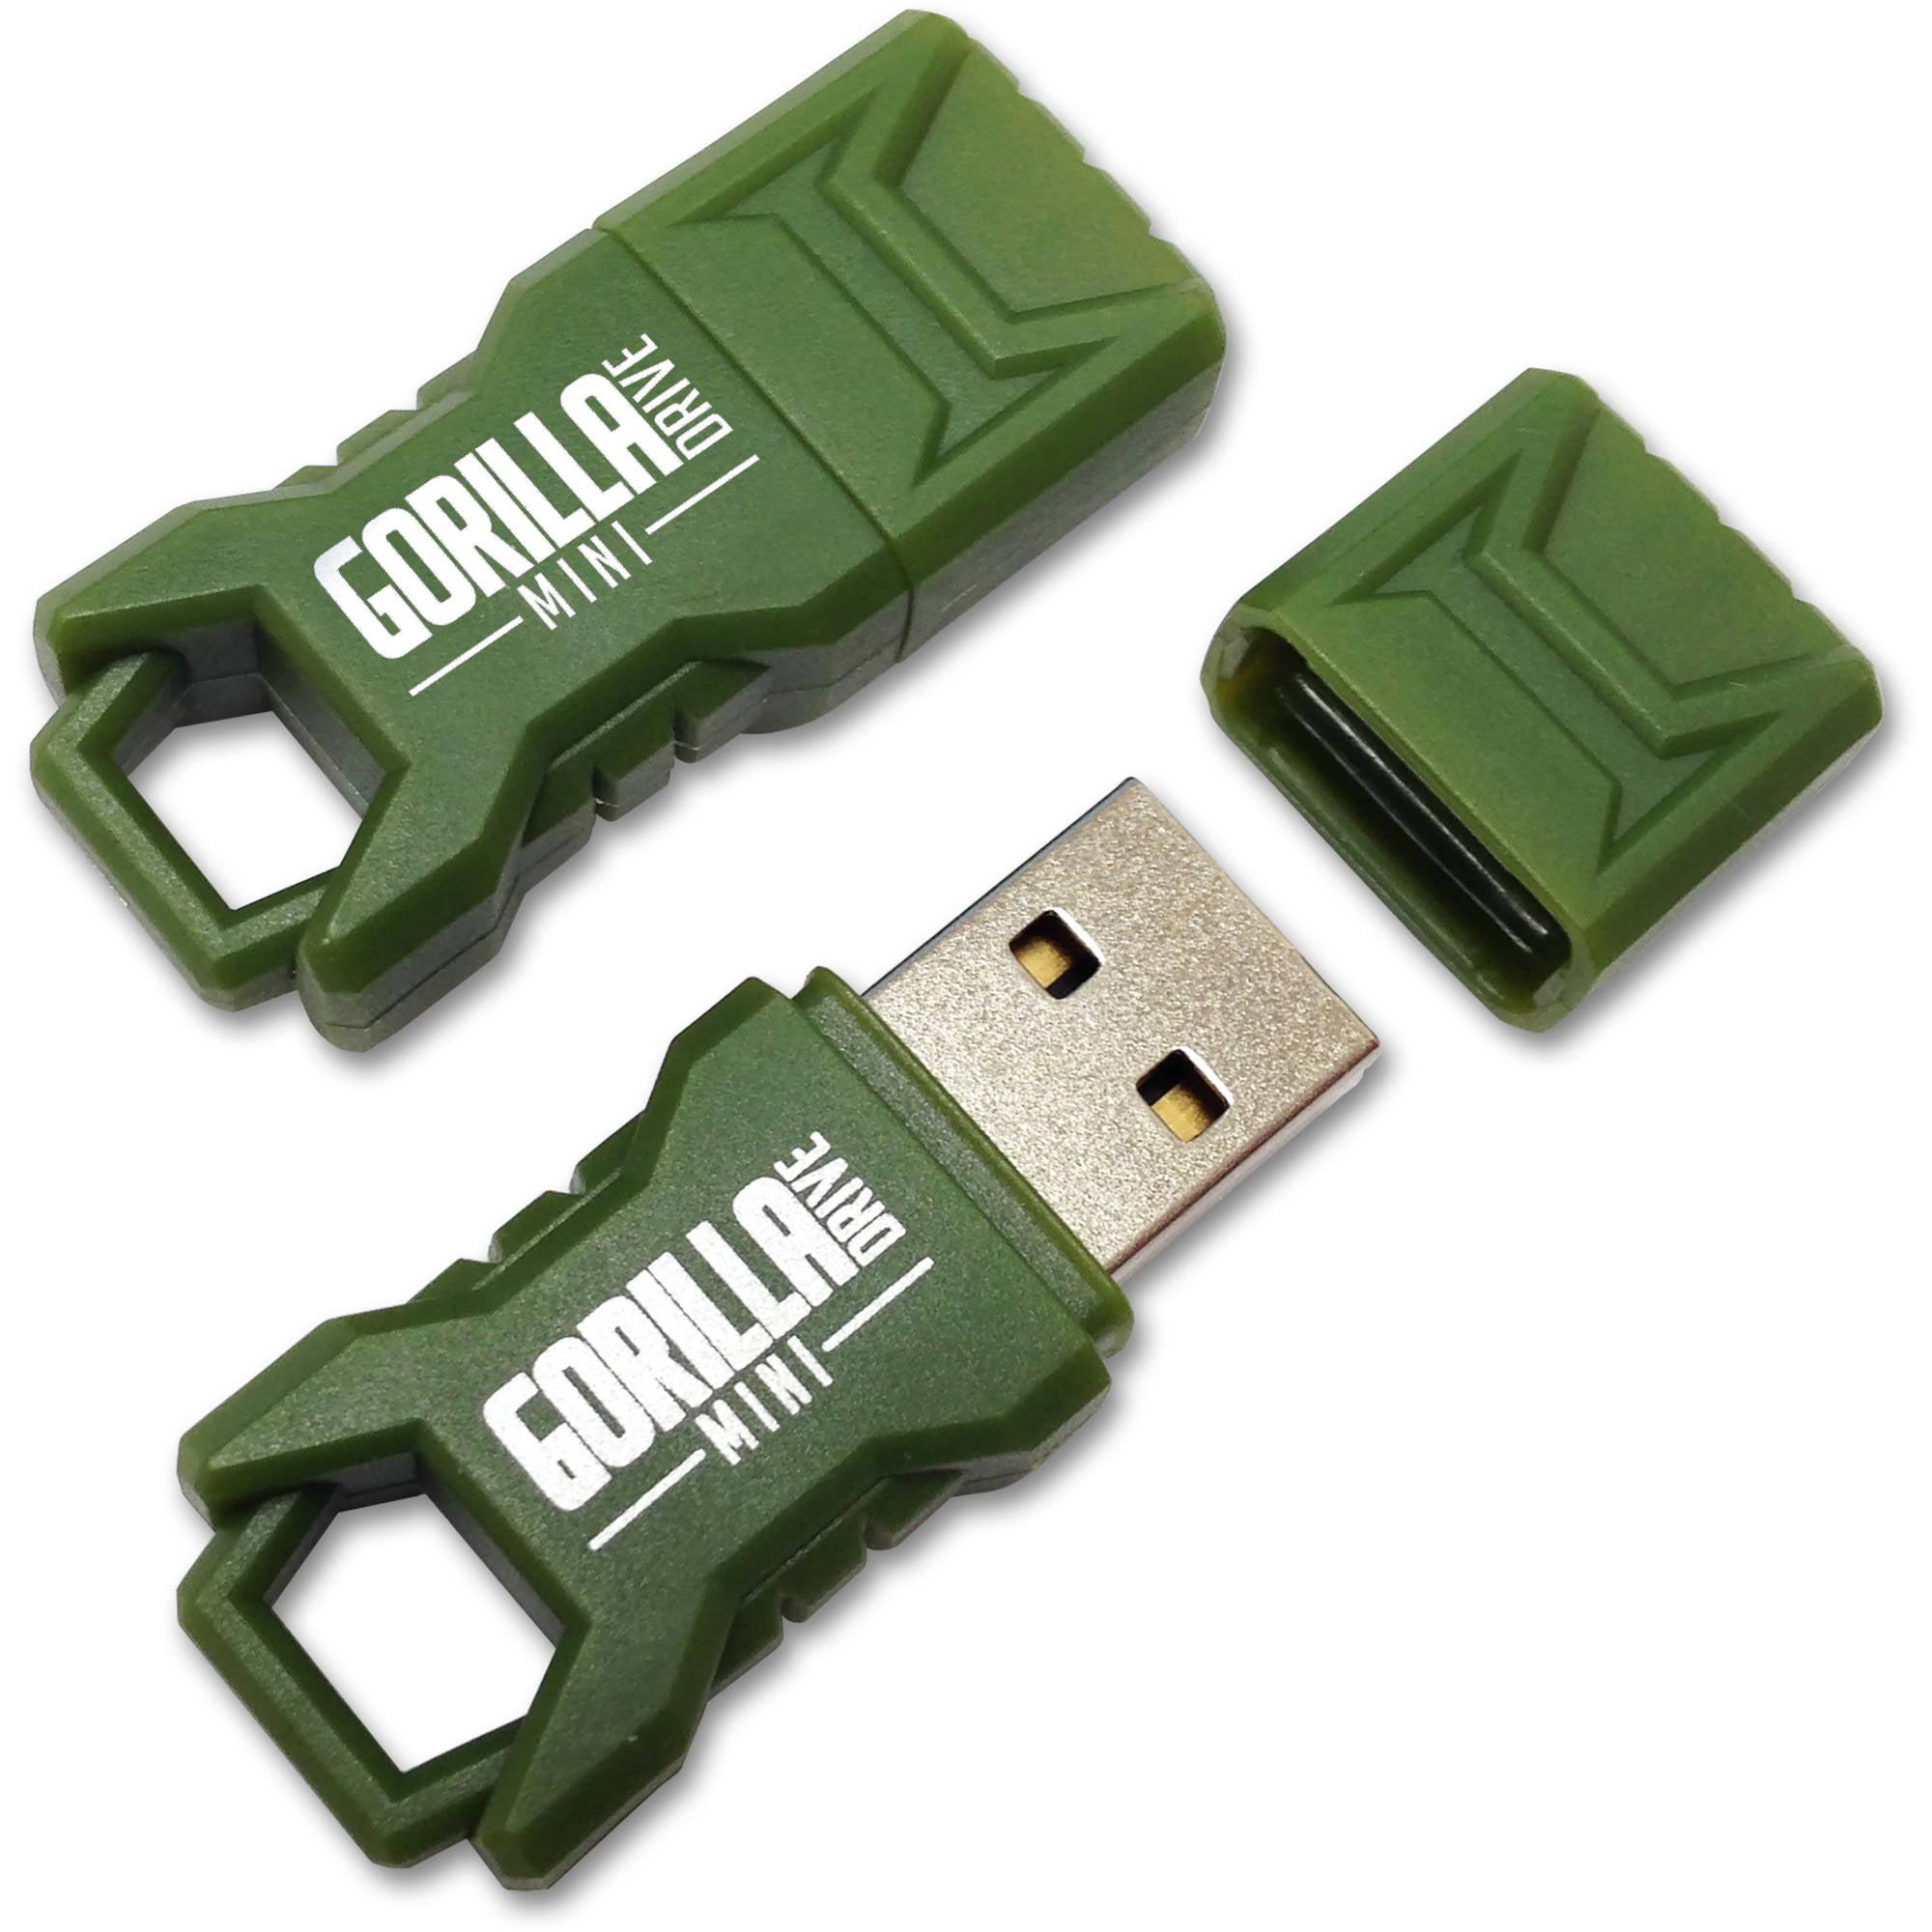 EP Green Mini GorillaDrive 16GB Rugged USB Flash Drive, 2-Pack